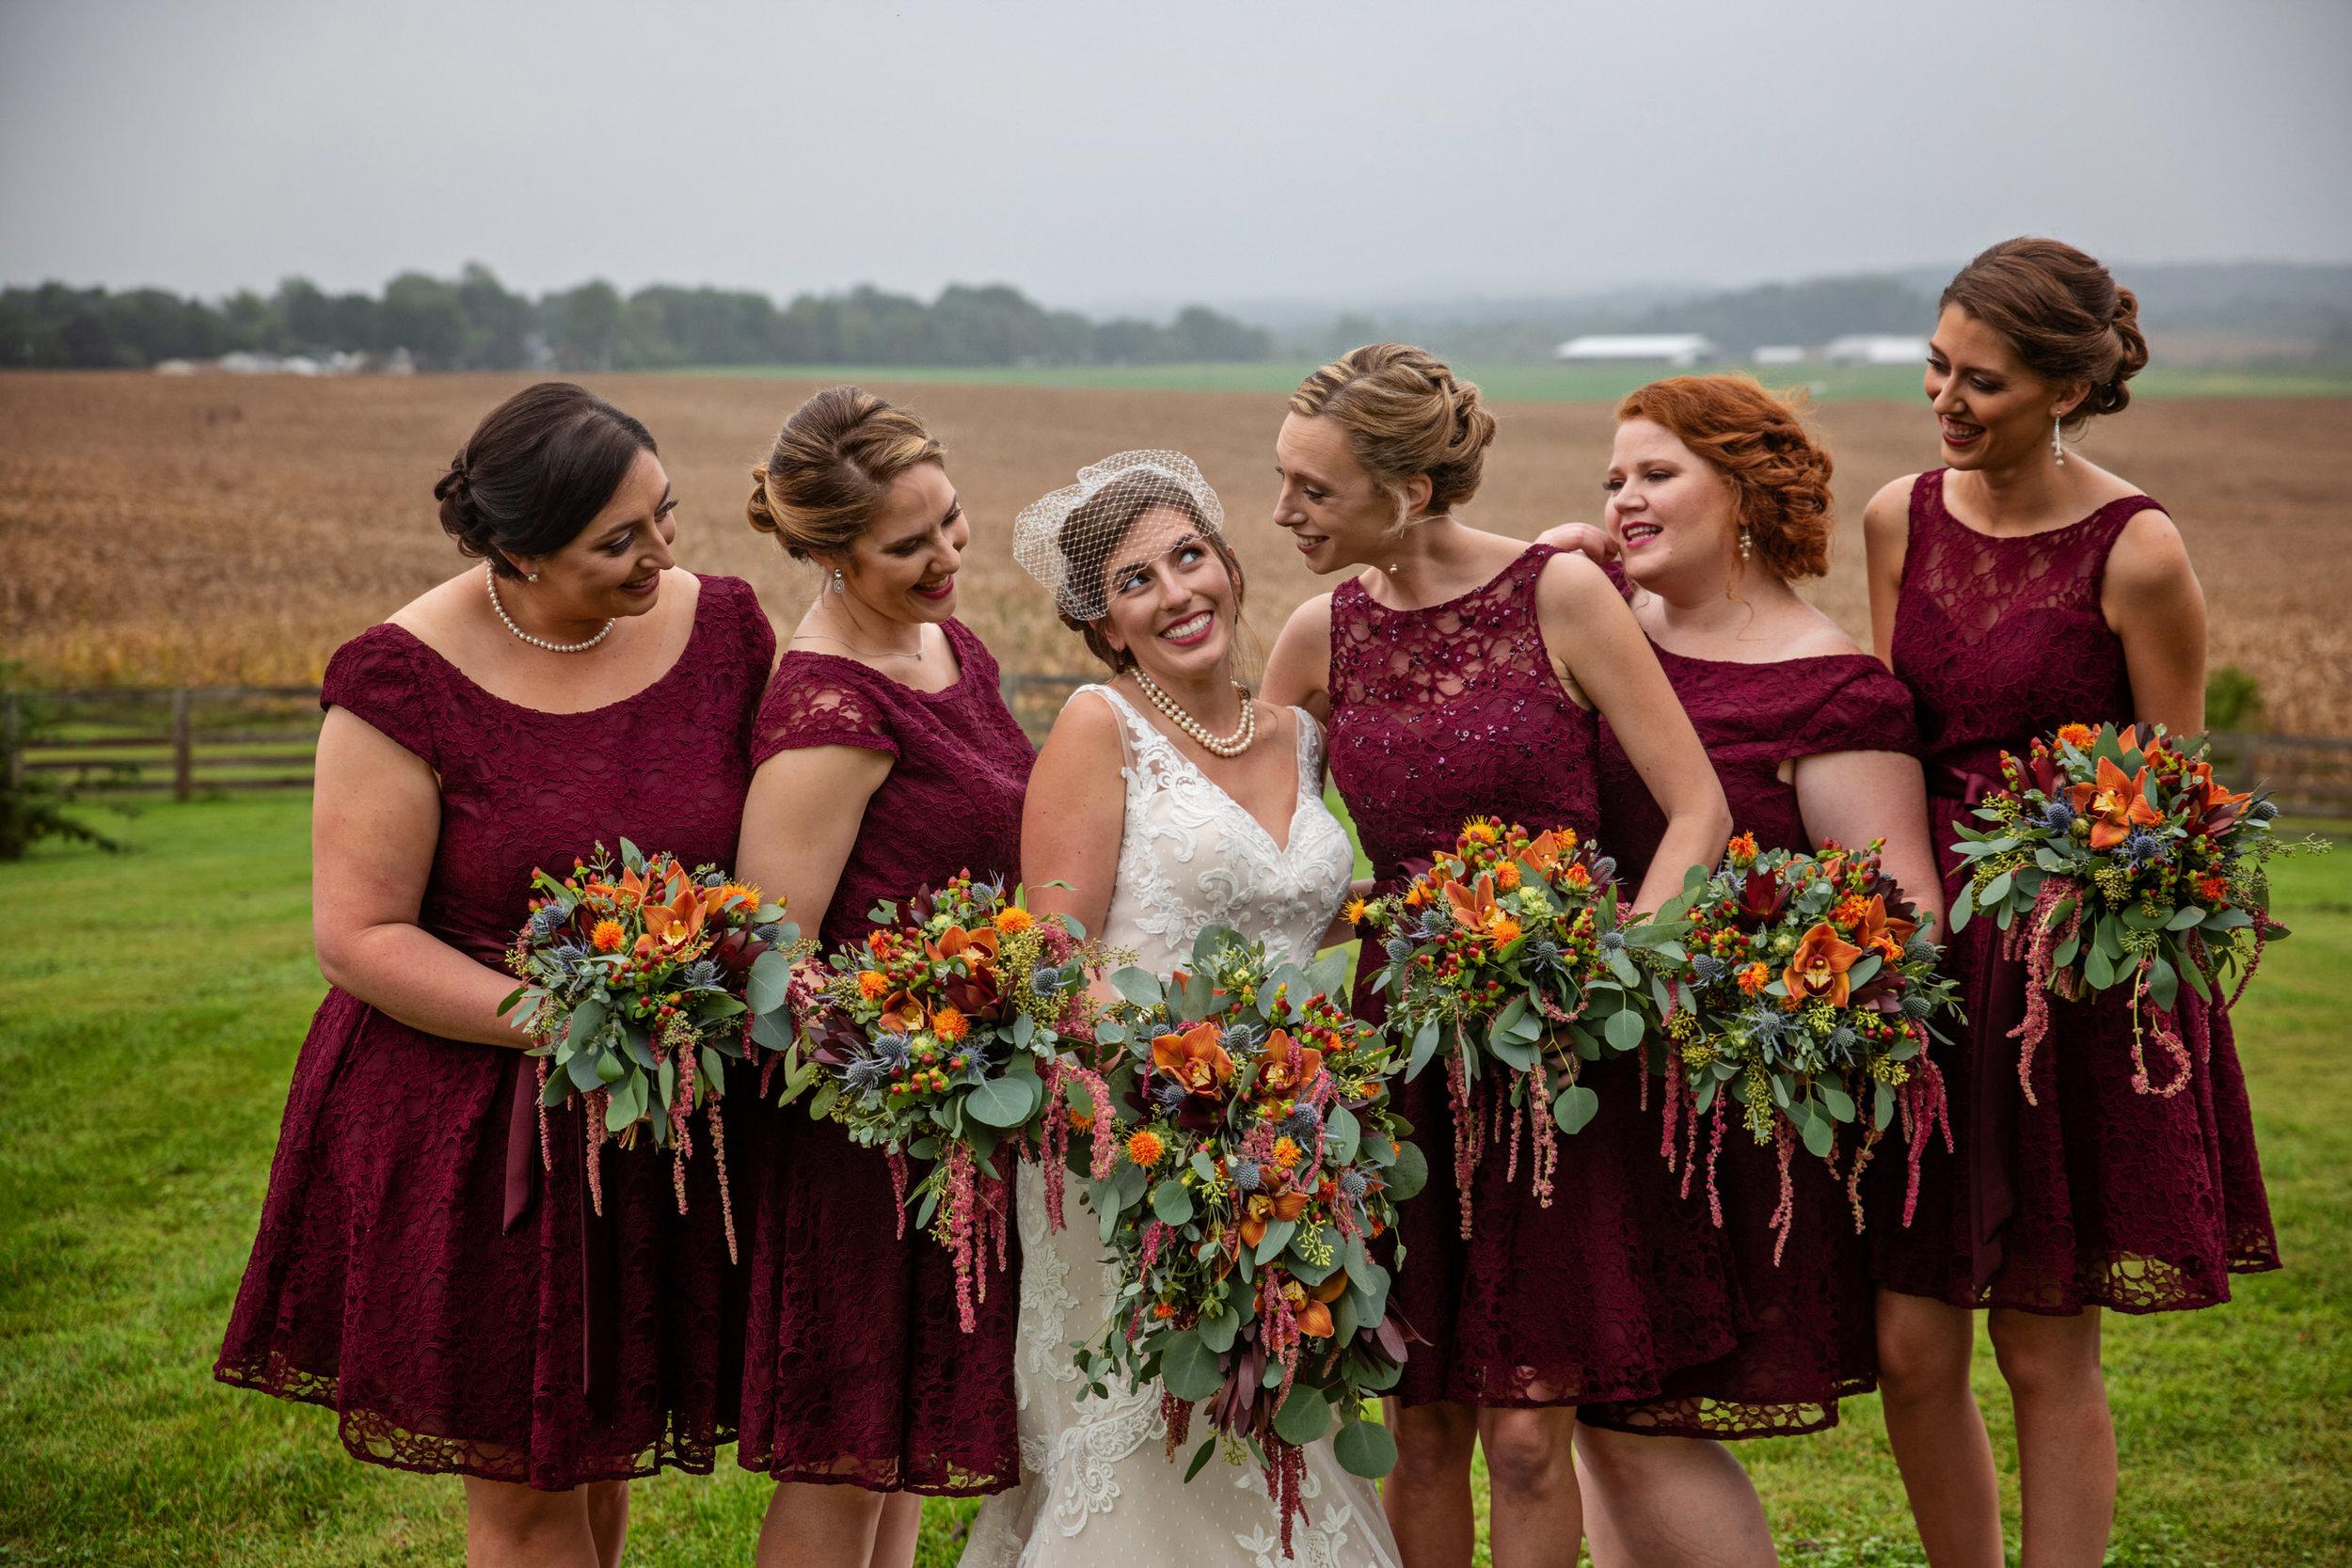 WalkersOverlookWedding-Angela&Ben-WeddingParty-7.jpg